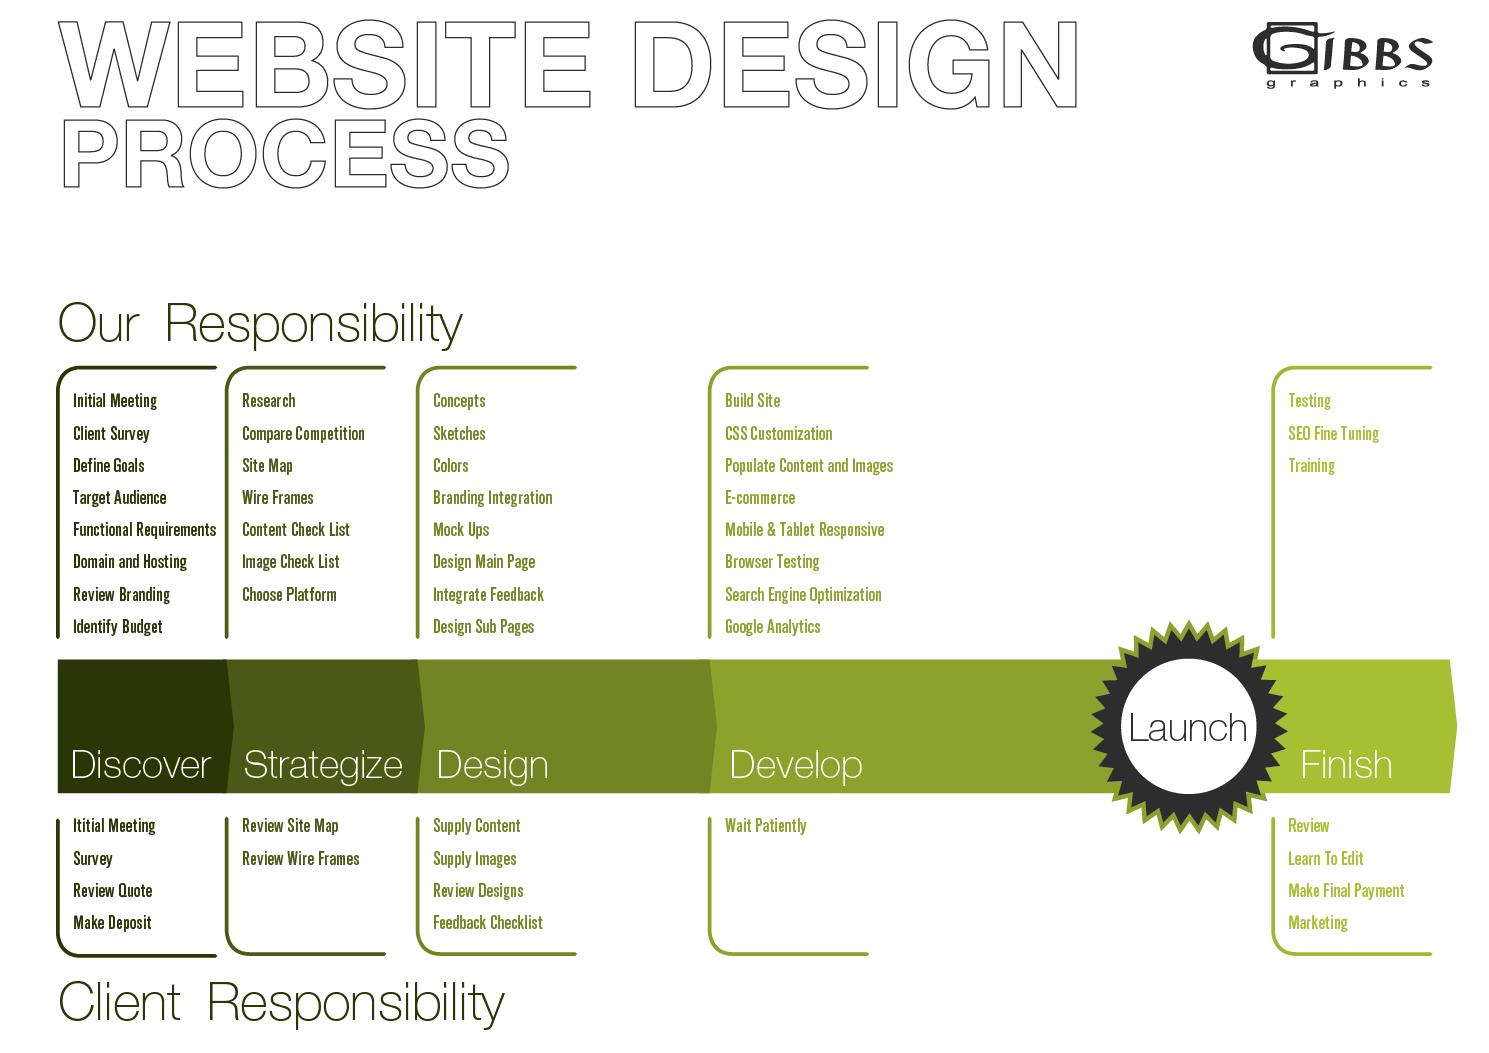 Gibbs Graphics web process